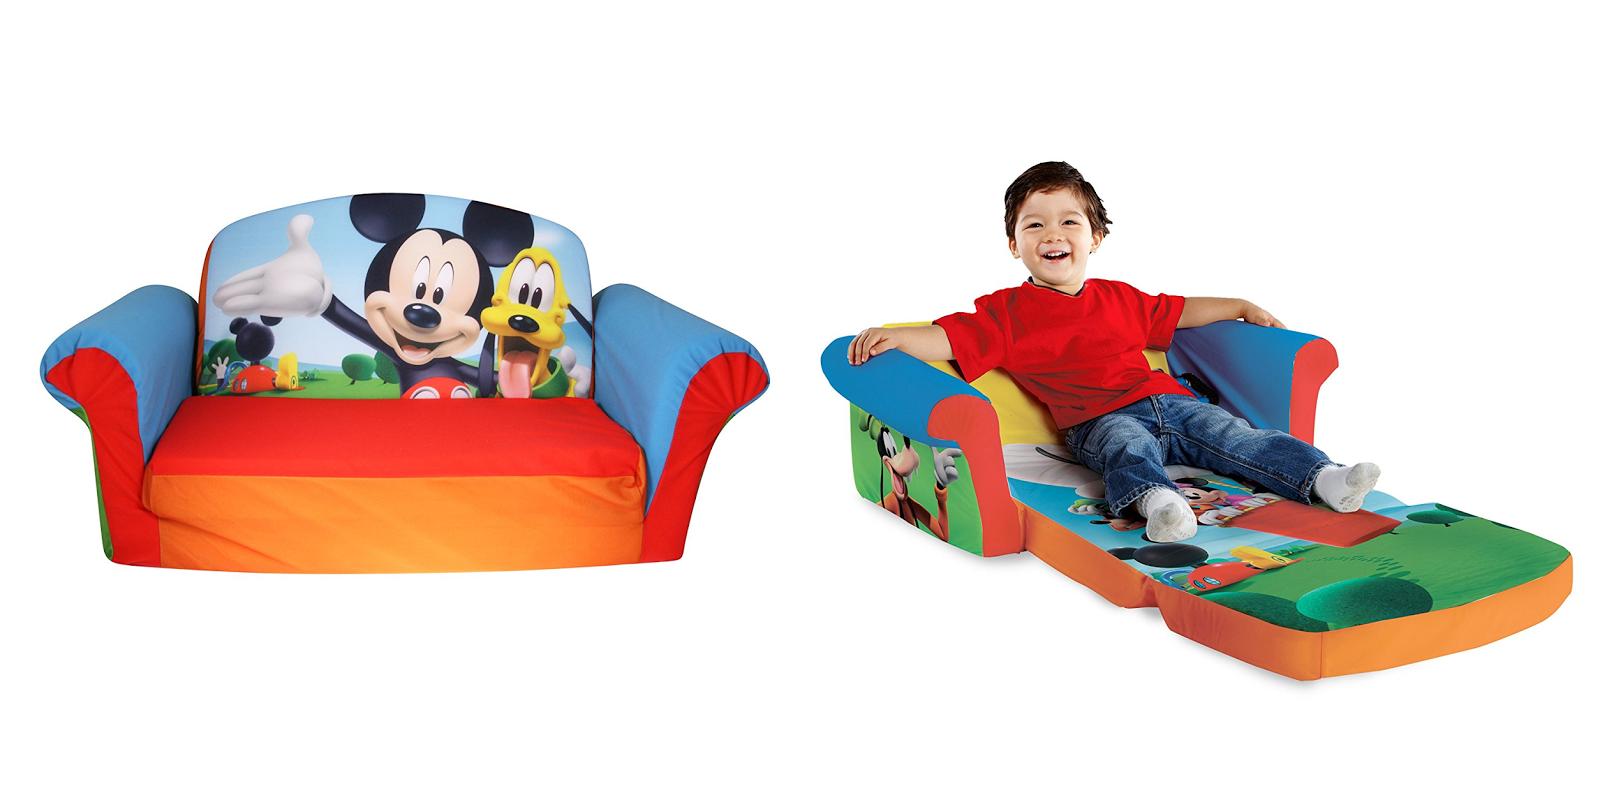 Amazon 2449 Reg 4999 Marshmallow Furniture Childrens 2 In 1